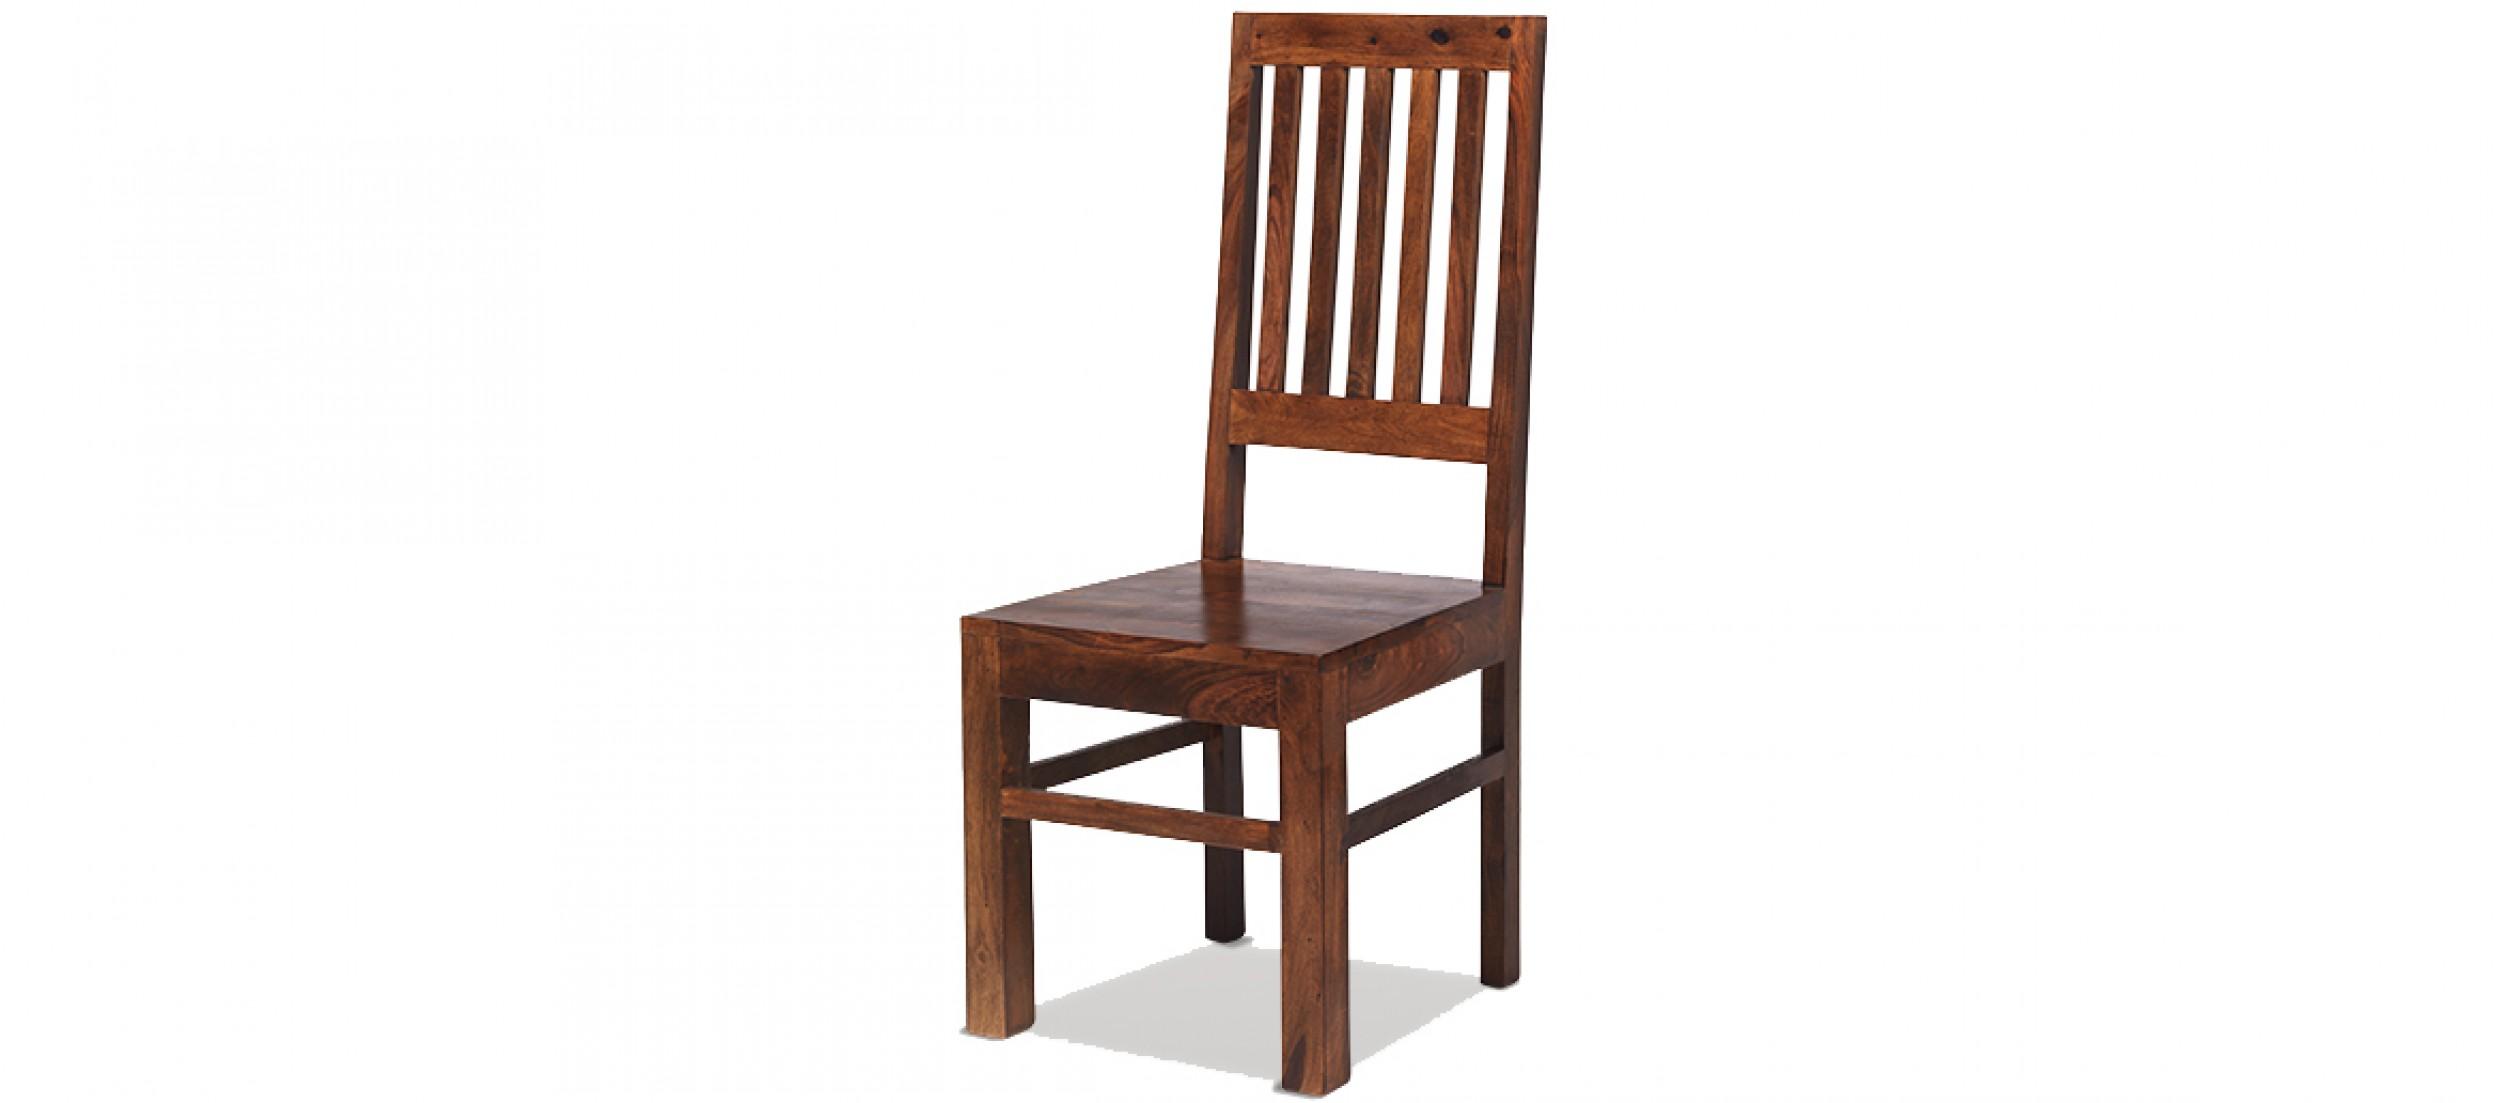 Jali Sheesham High Back Slat Dining Chairs Pair